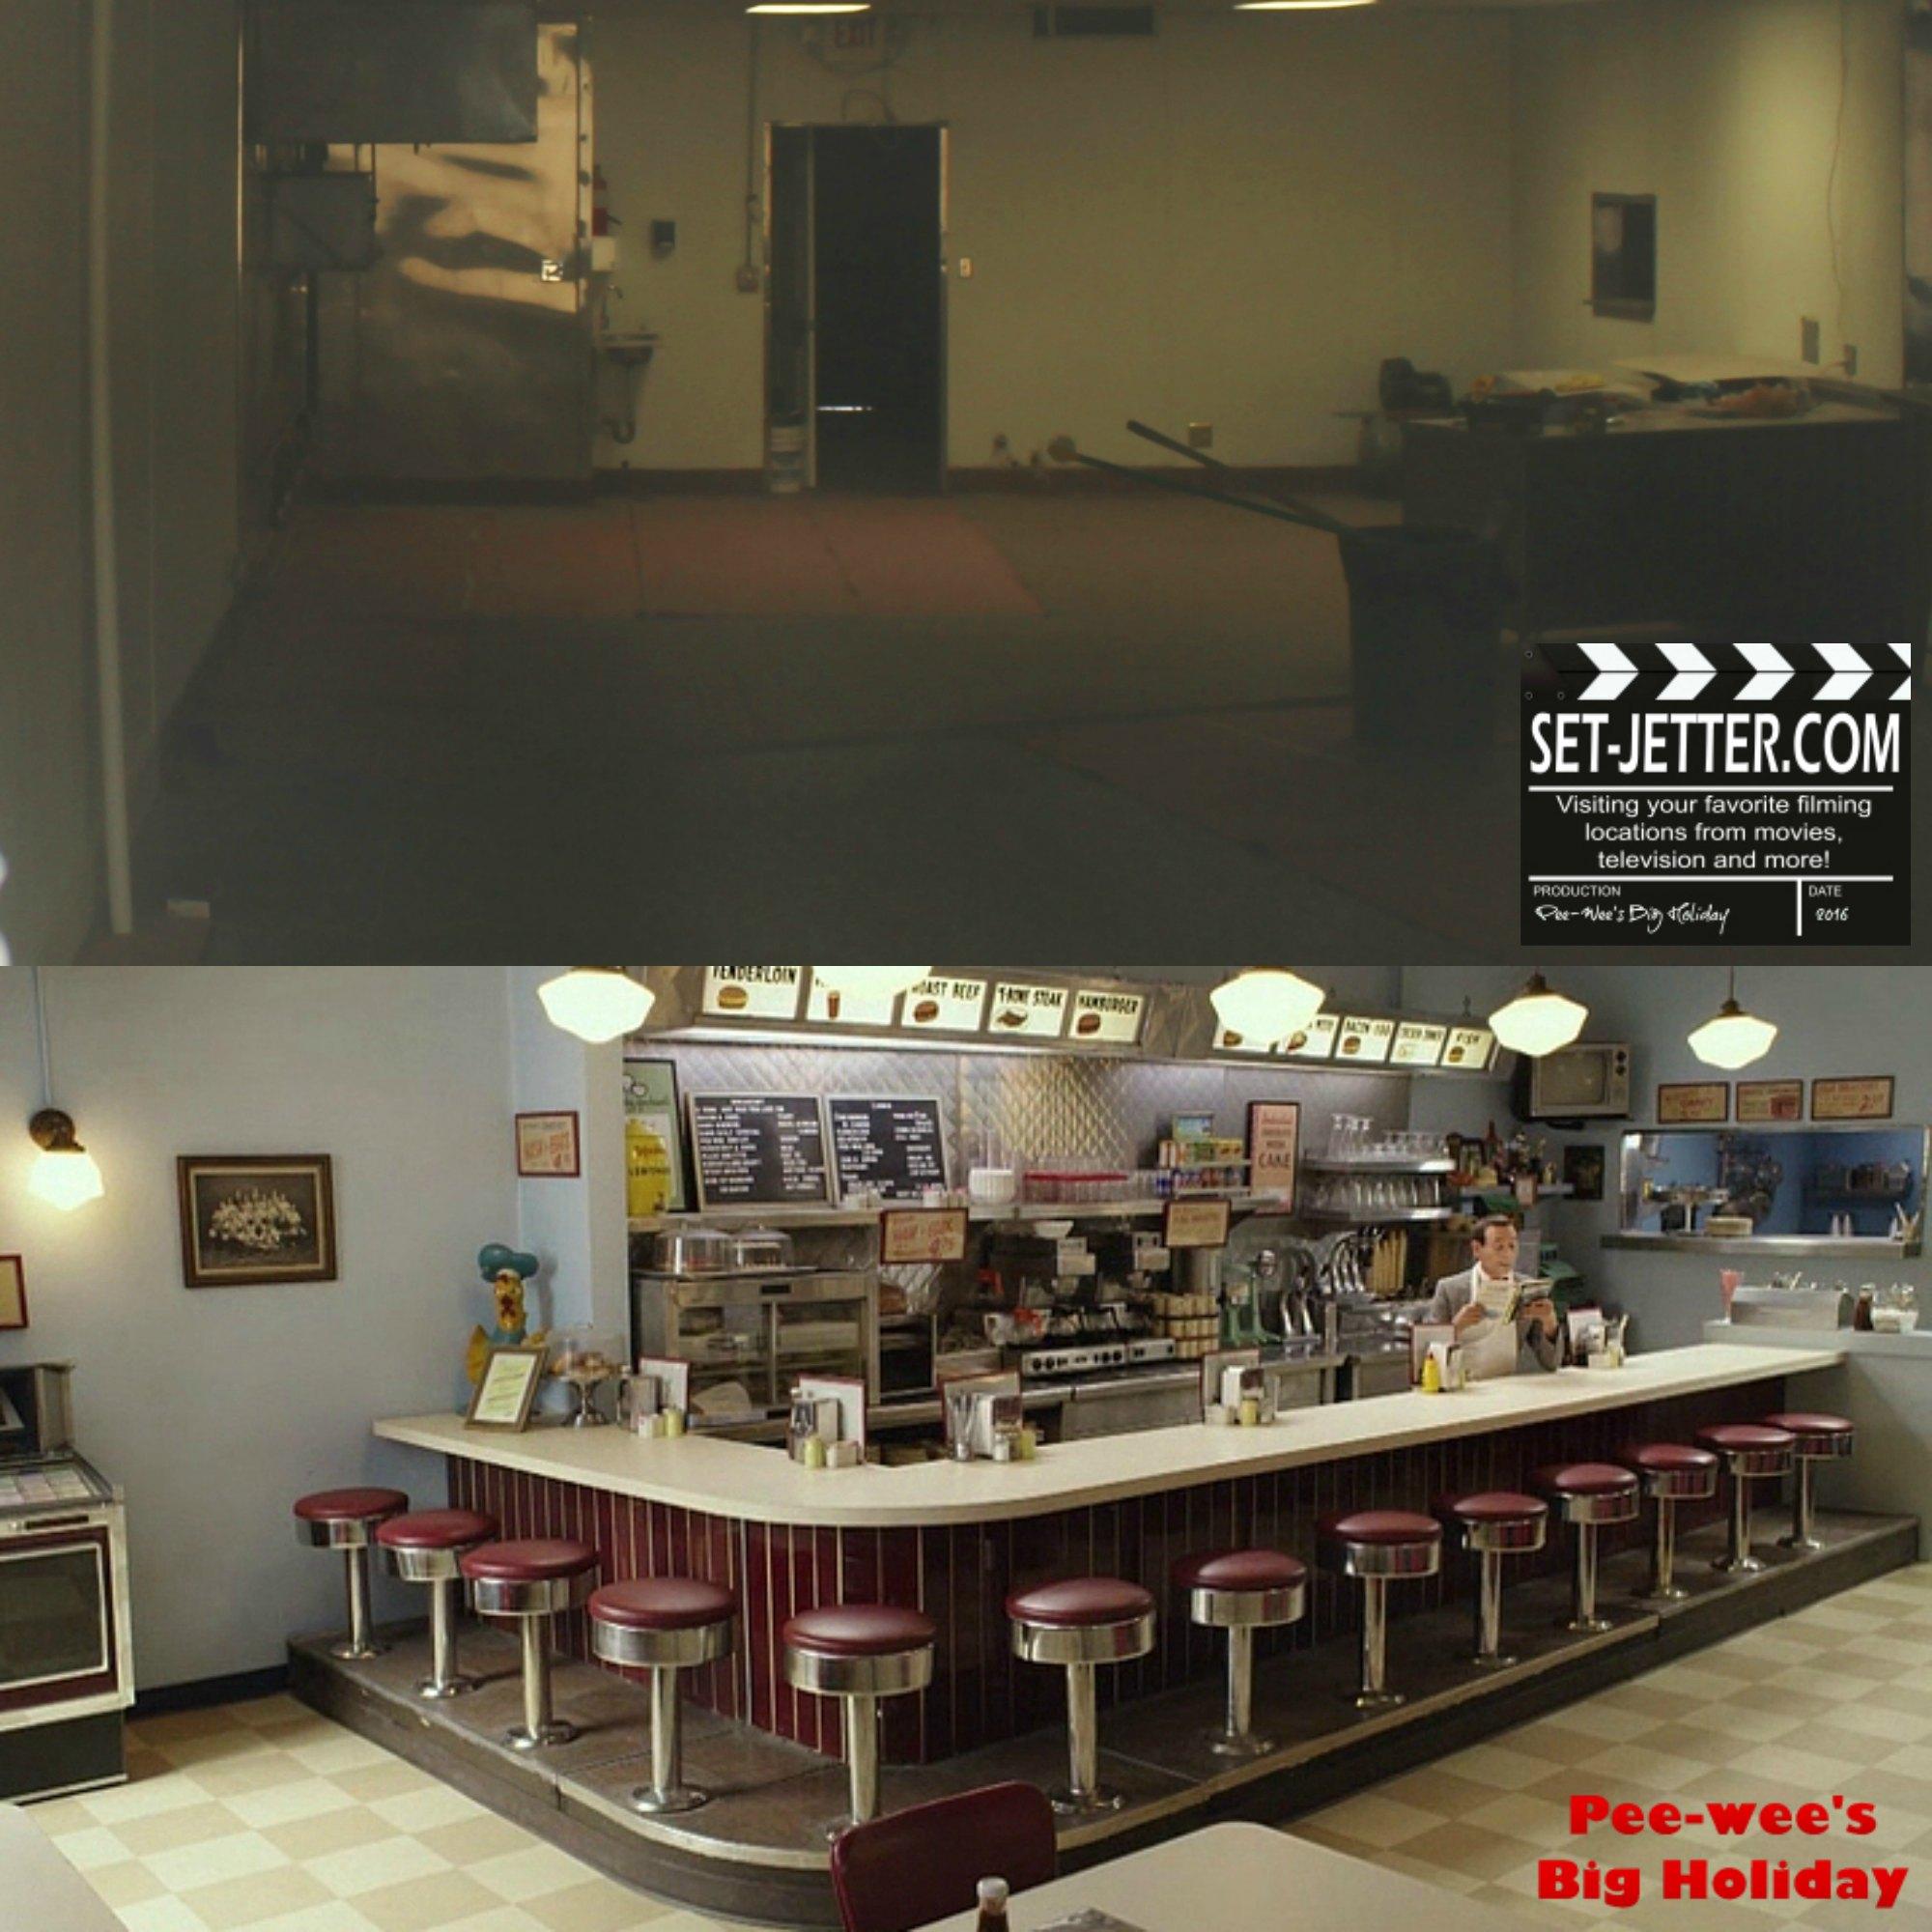 Pee Wee's Big Holiday comparison 294.jpg